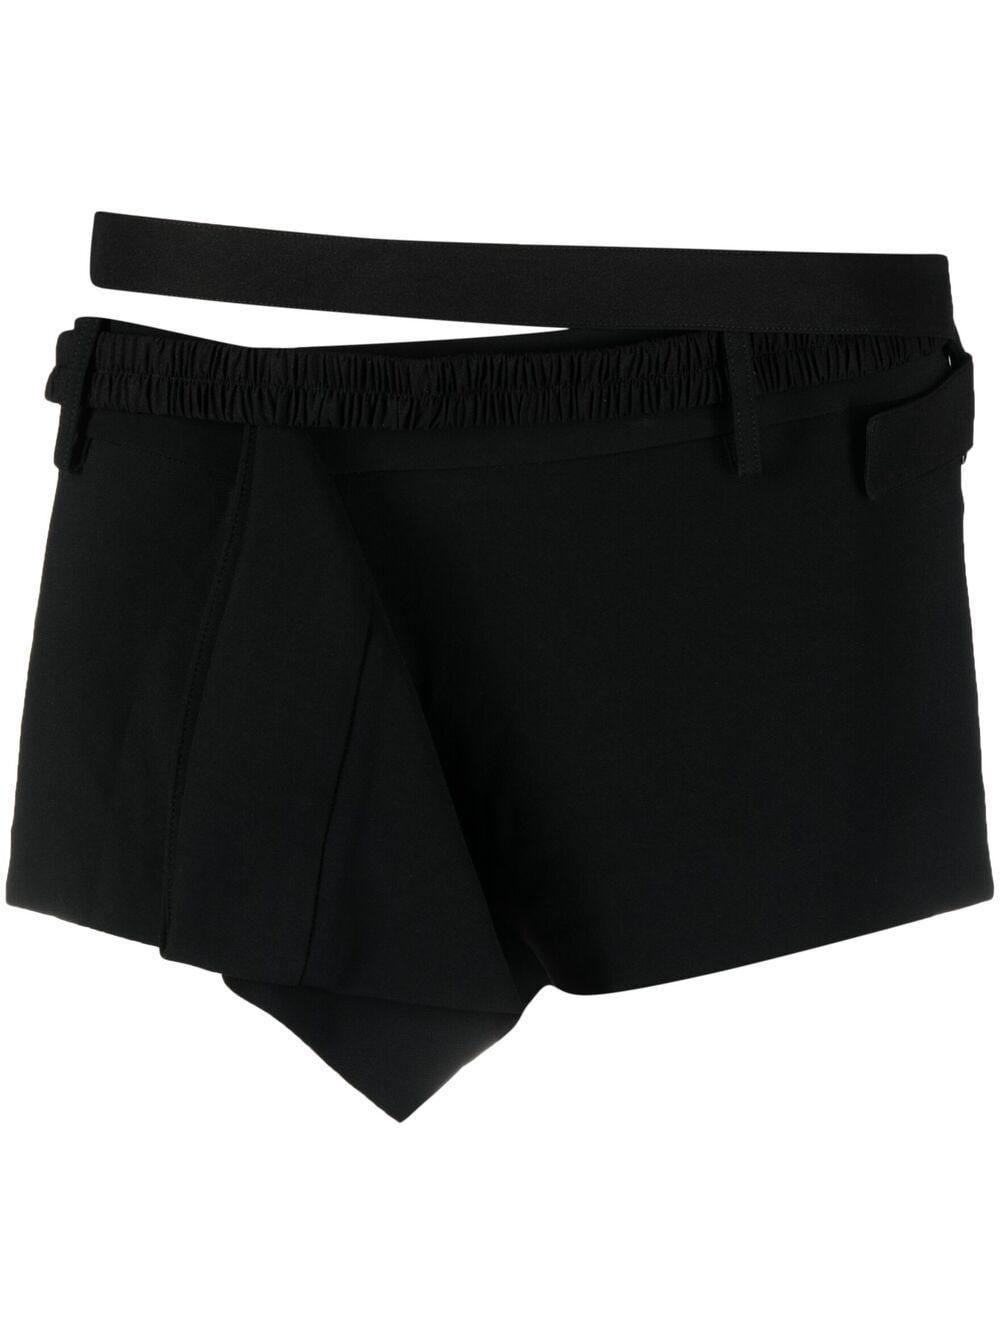 nensi dojaka deconstructed mini shorts